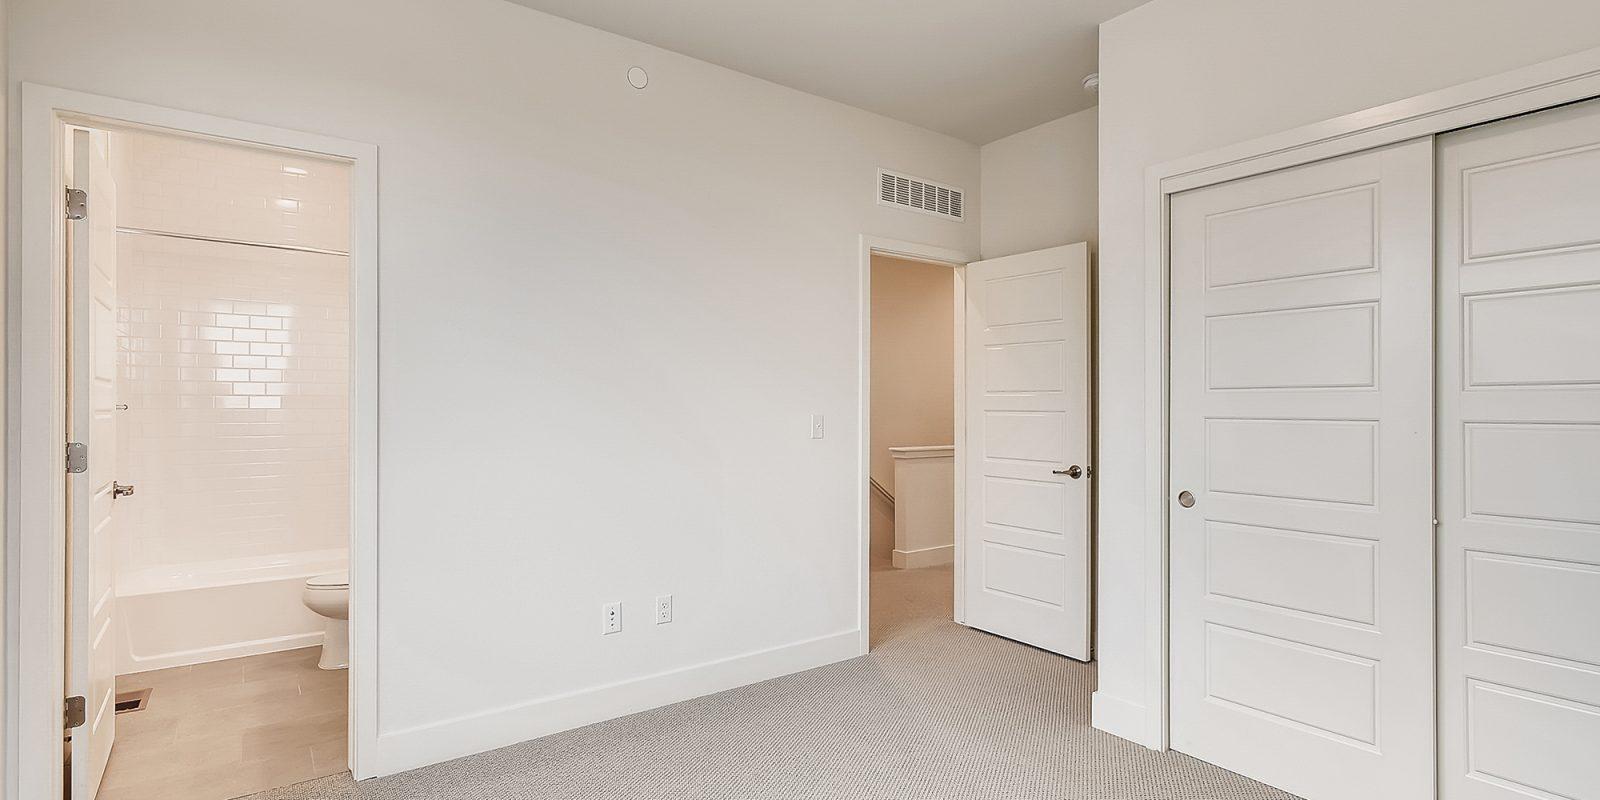 WestRidge DoMore Rows: Oasis - Secondary Bedroom